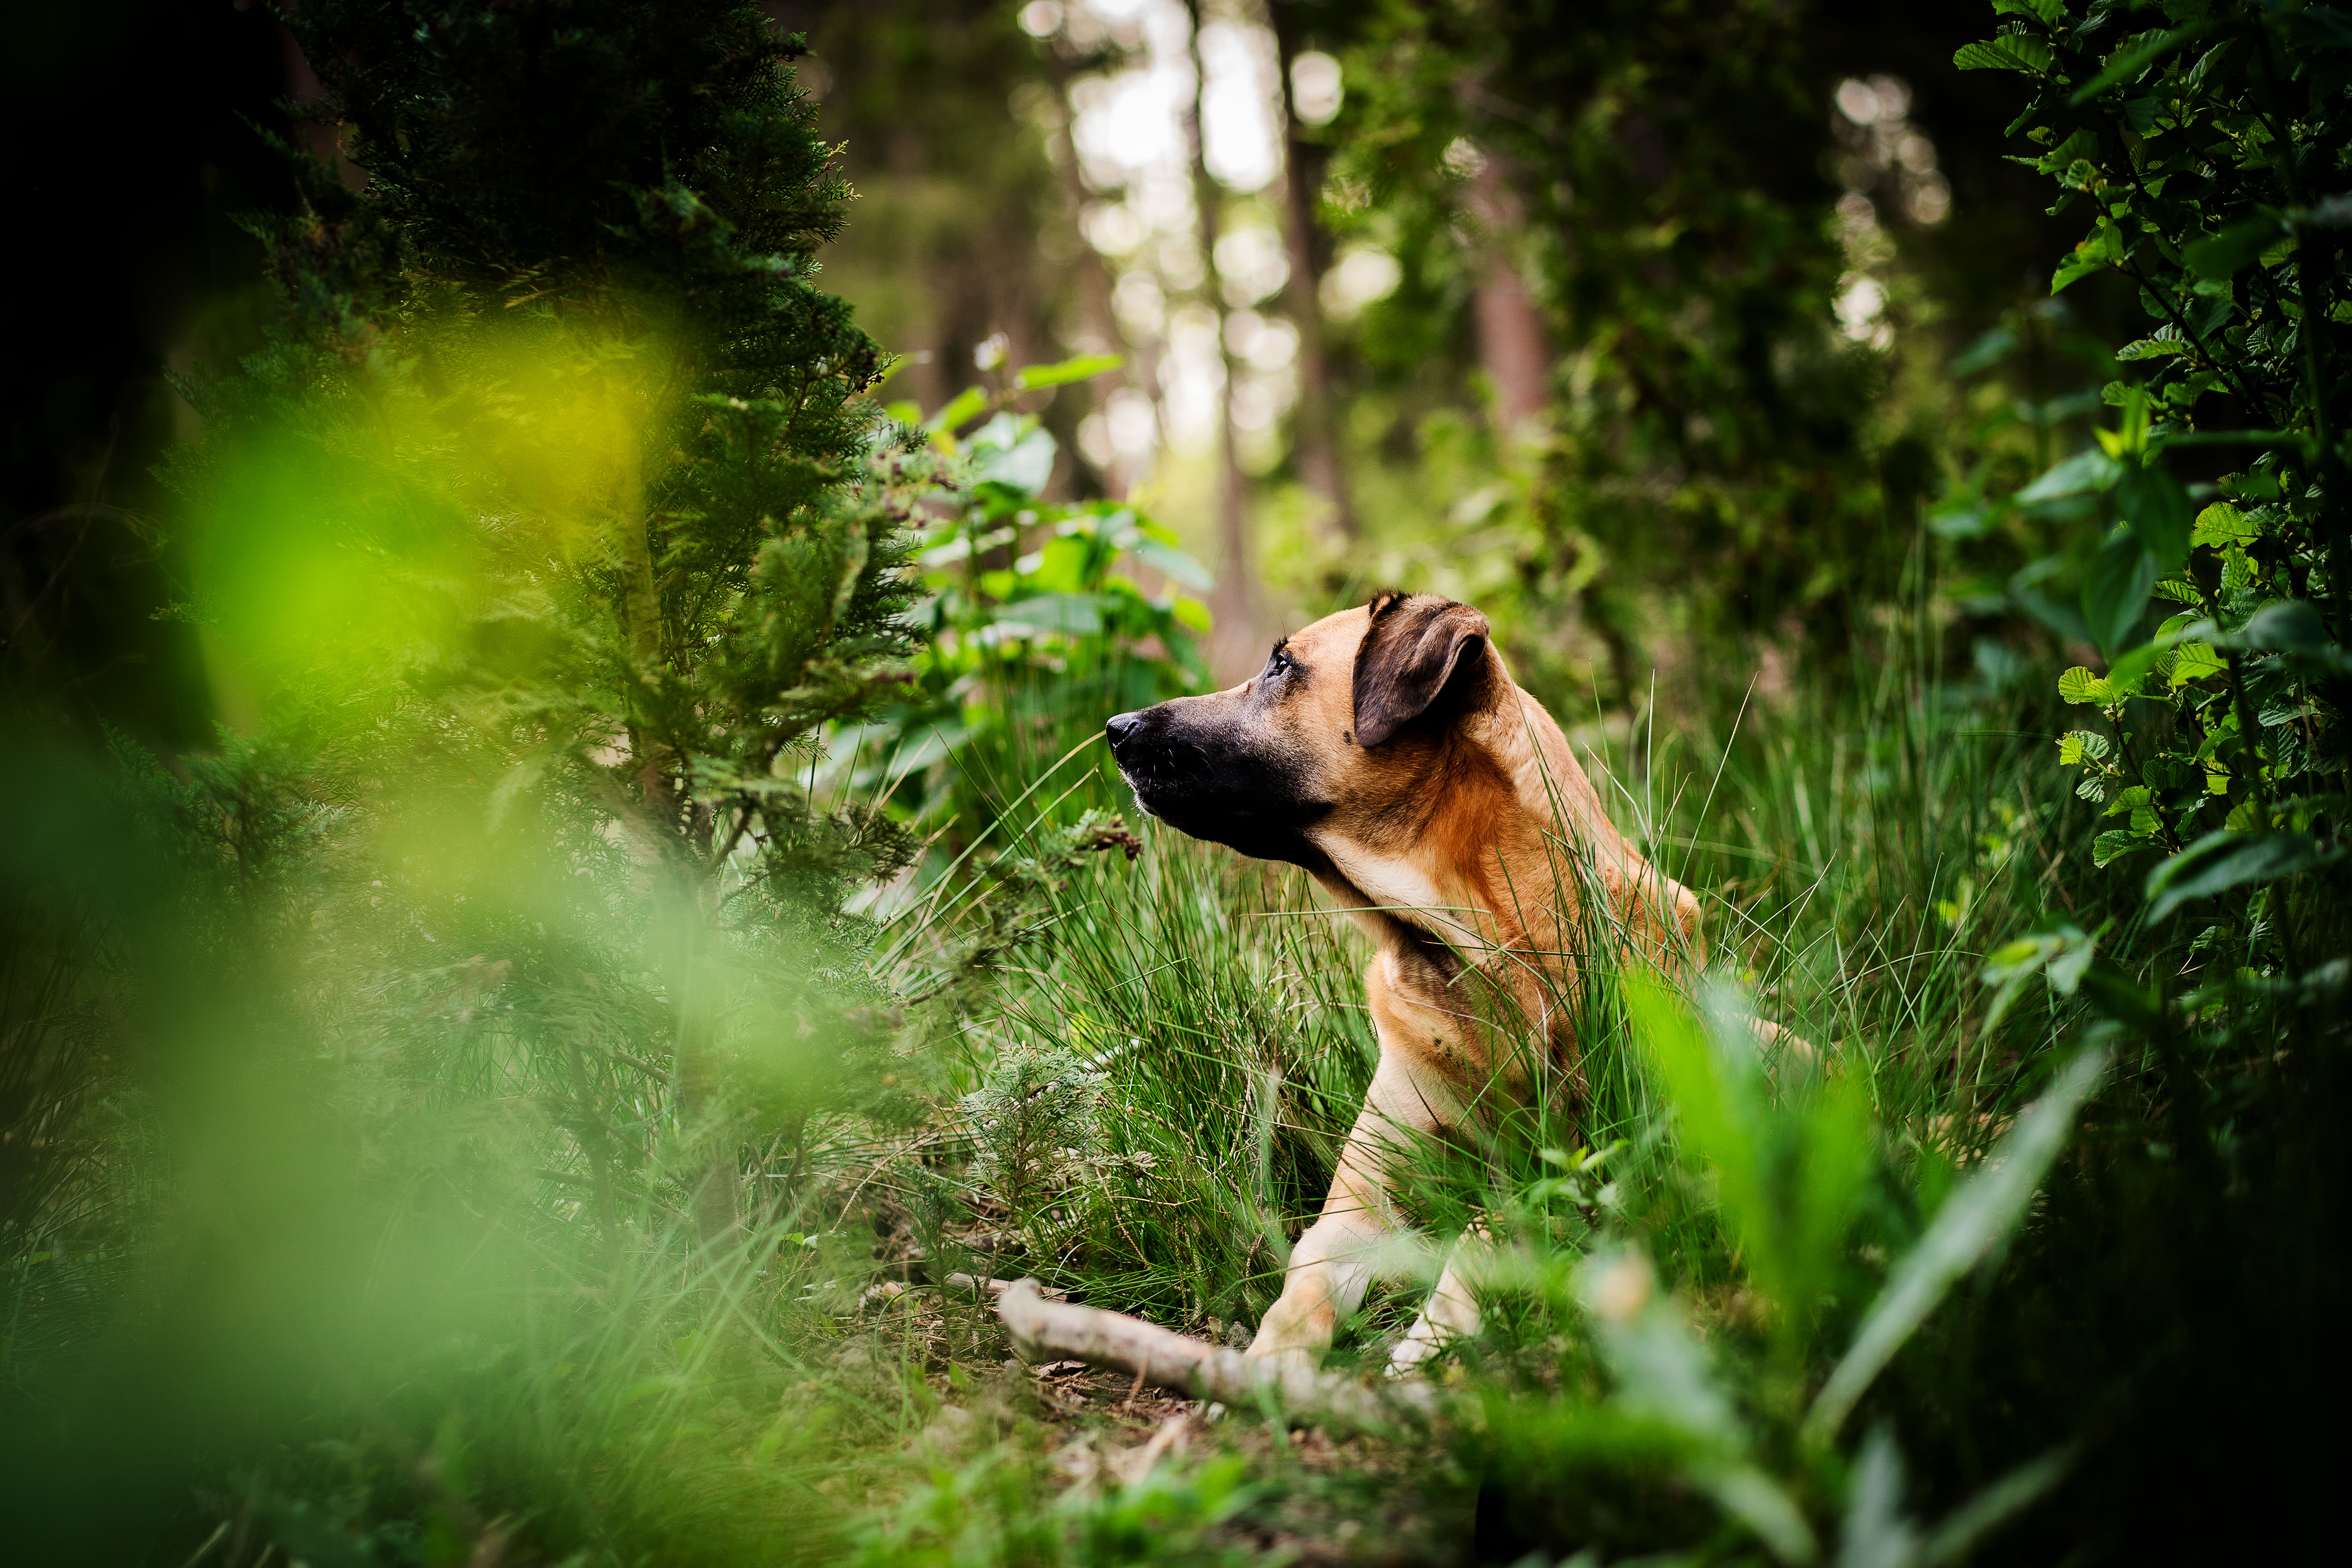 Hund, Hundefoto, Hundefotografie, Hundefotografin, Retriever, Labrador Retriever, Mix, Mischling, Rodesian Ridgeback,